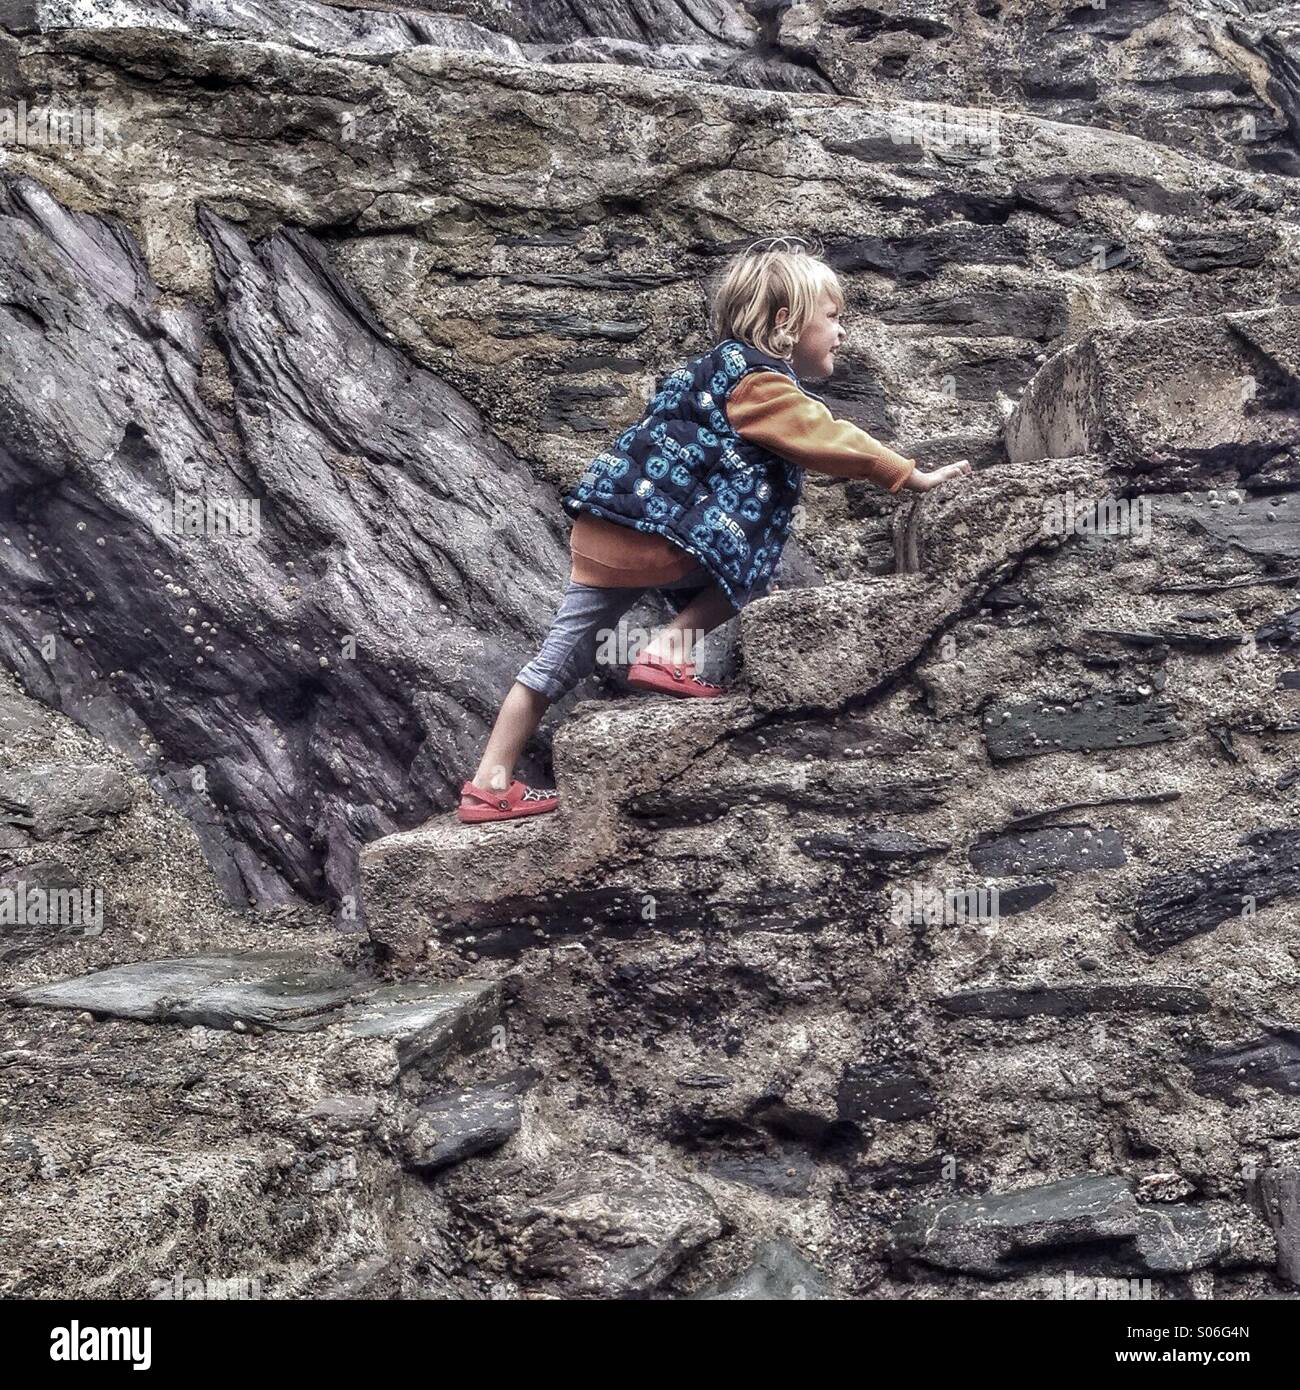 Passaggi d'arrampicate Immagini Stock